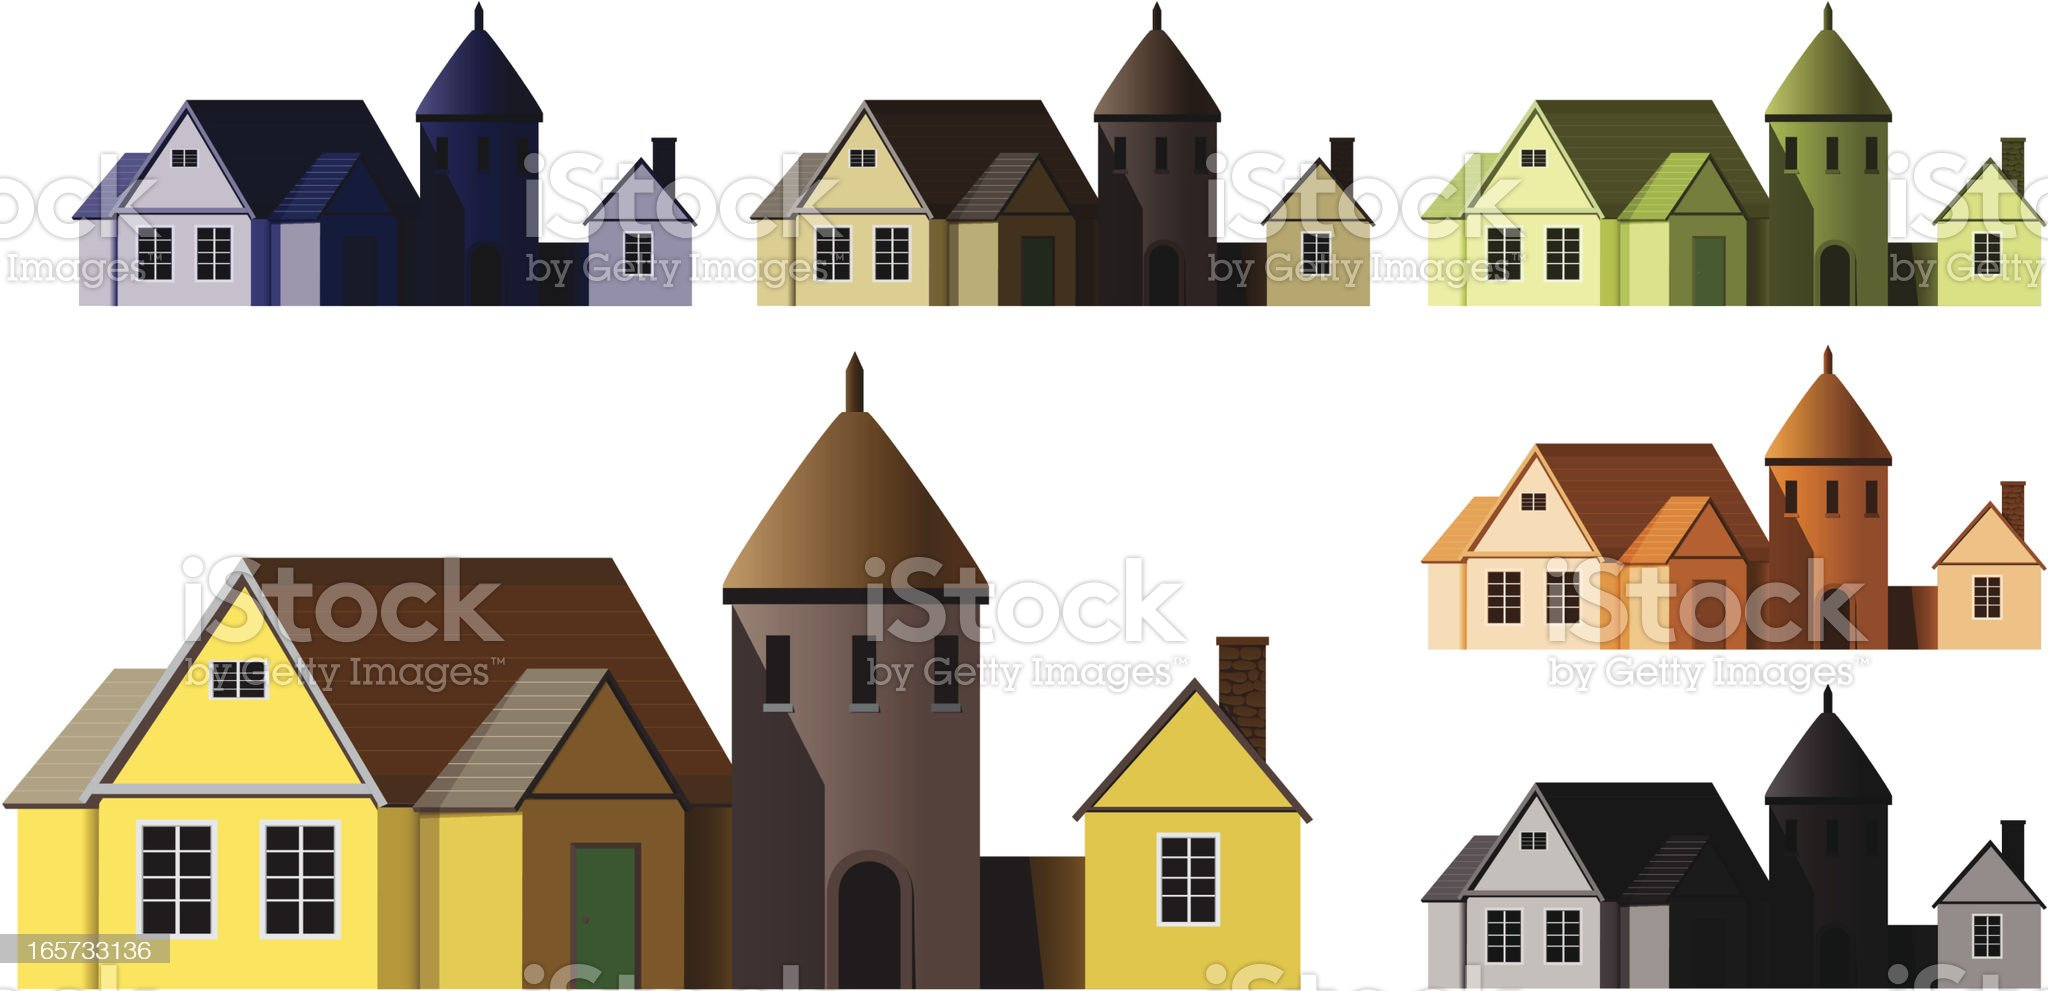 Rural House royalty-free stock vector art